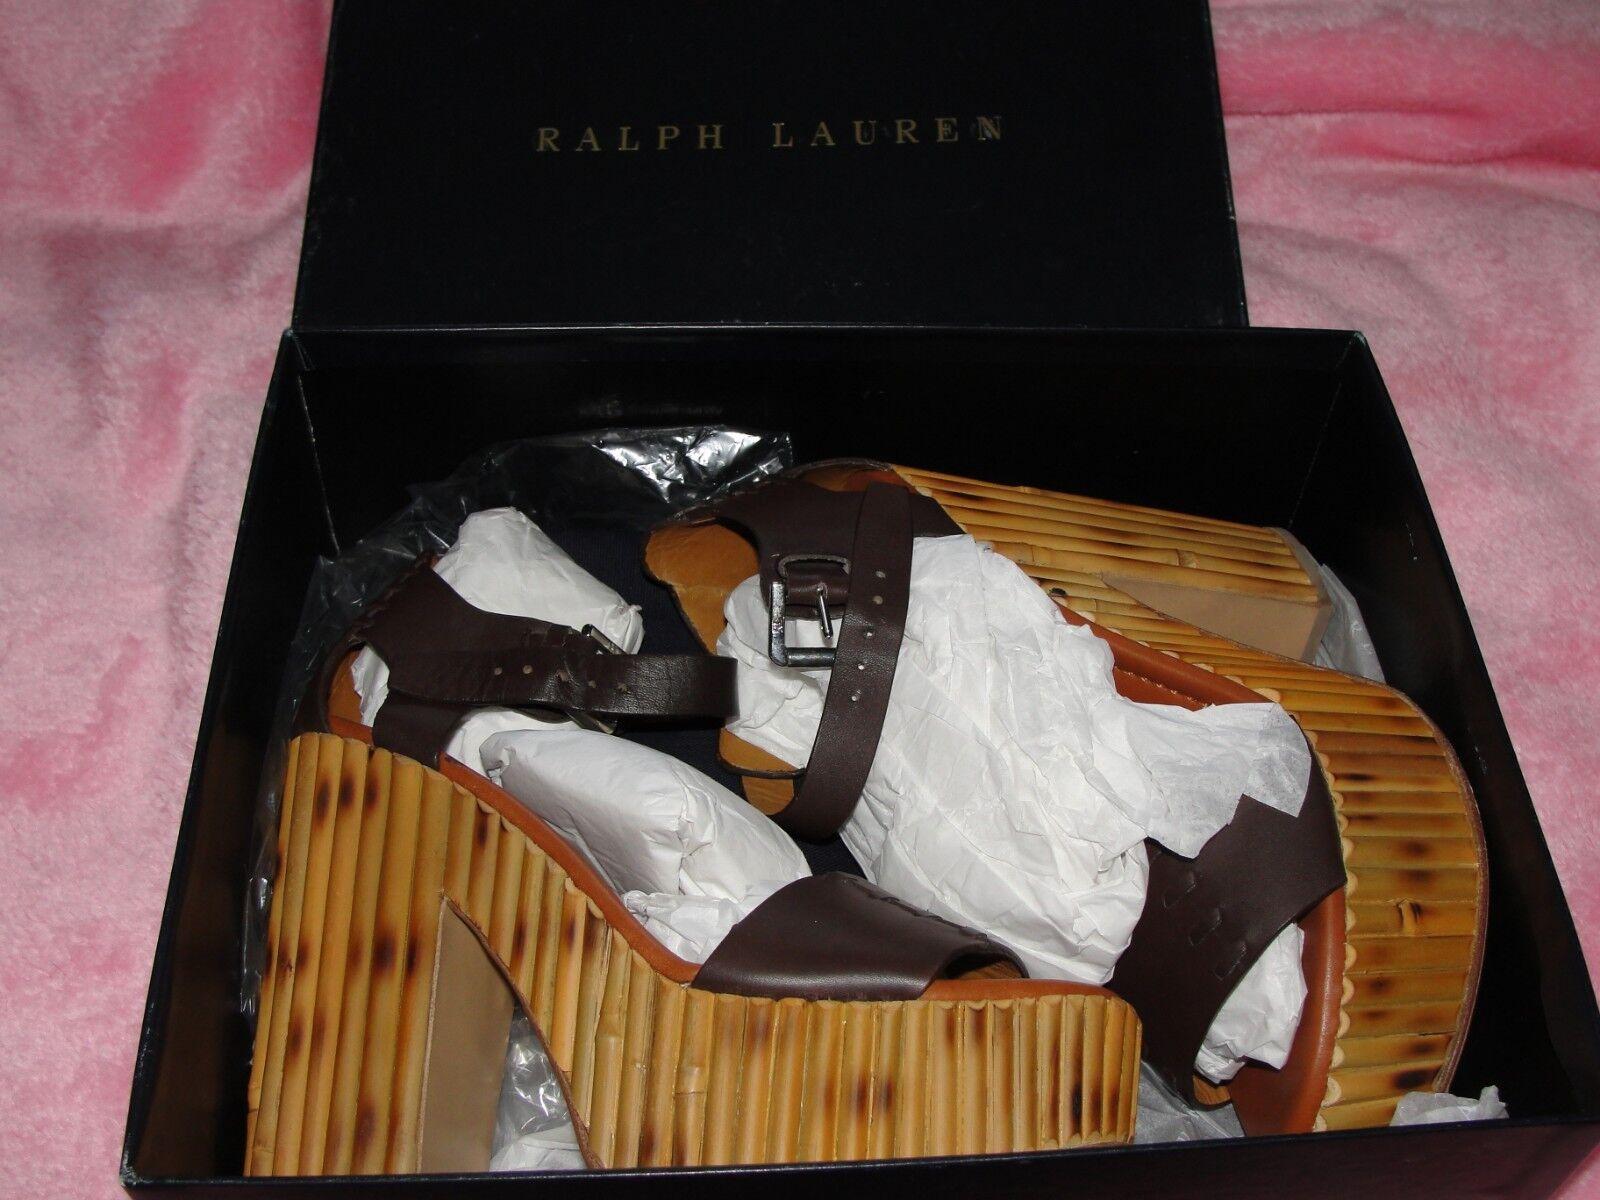 RARE Ralph Lauren Alira Bamboo Platform Sandal SIZE  US 6B - PRICE OVER 500GBP